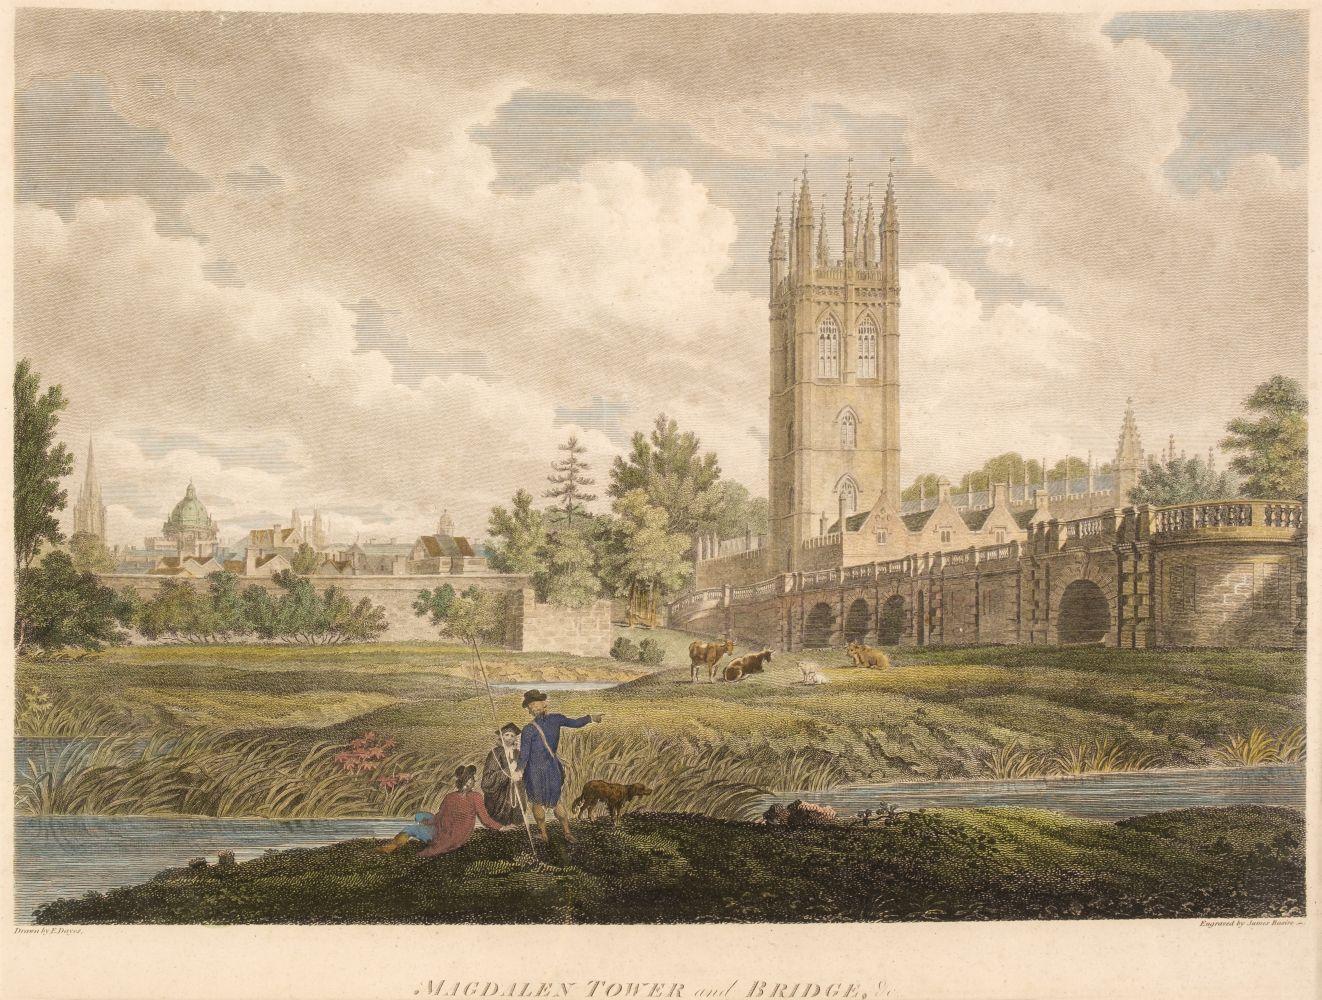 * Oxford. Basire (James), Magdalen Tower and Bridge, circa 1810